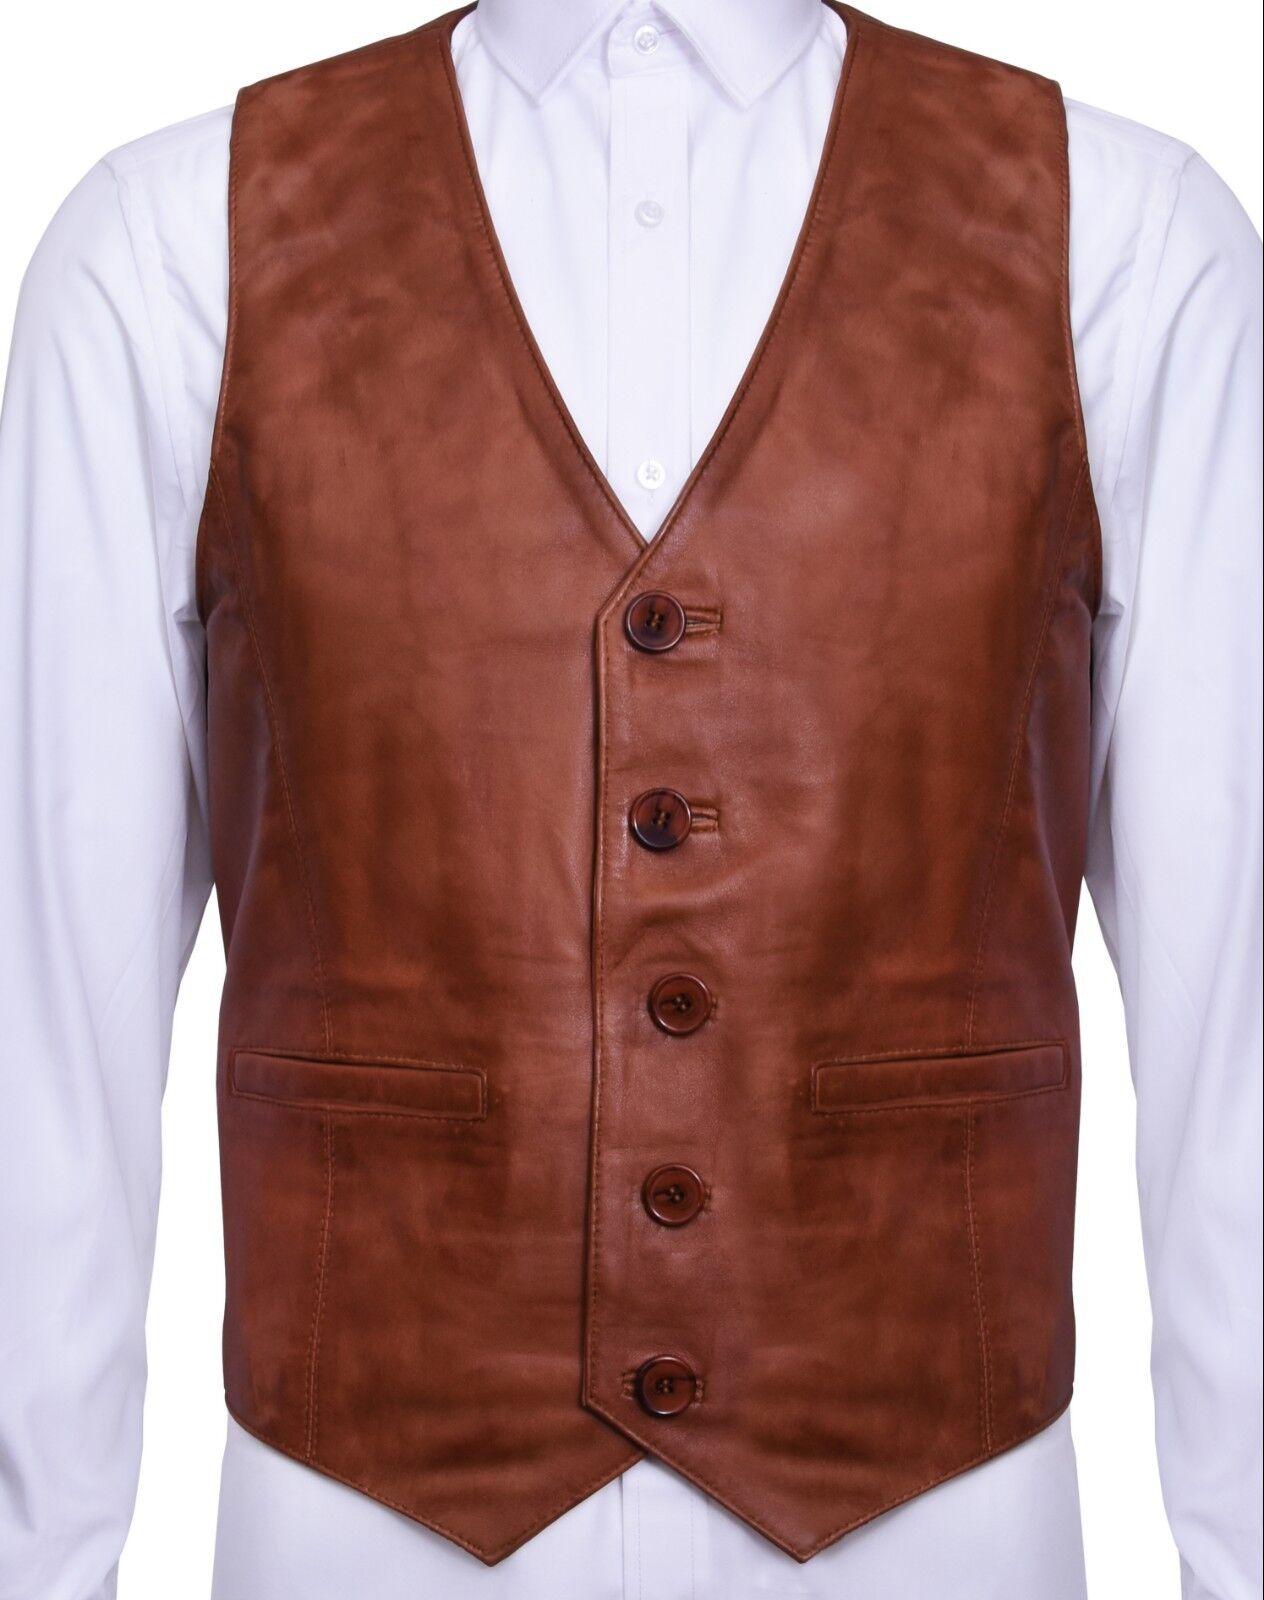 Herren Soft  Tan Leder Waistcoat Classic Casual Formal Traditional Gilet Vest